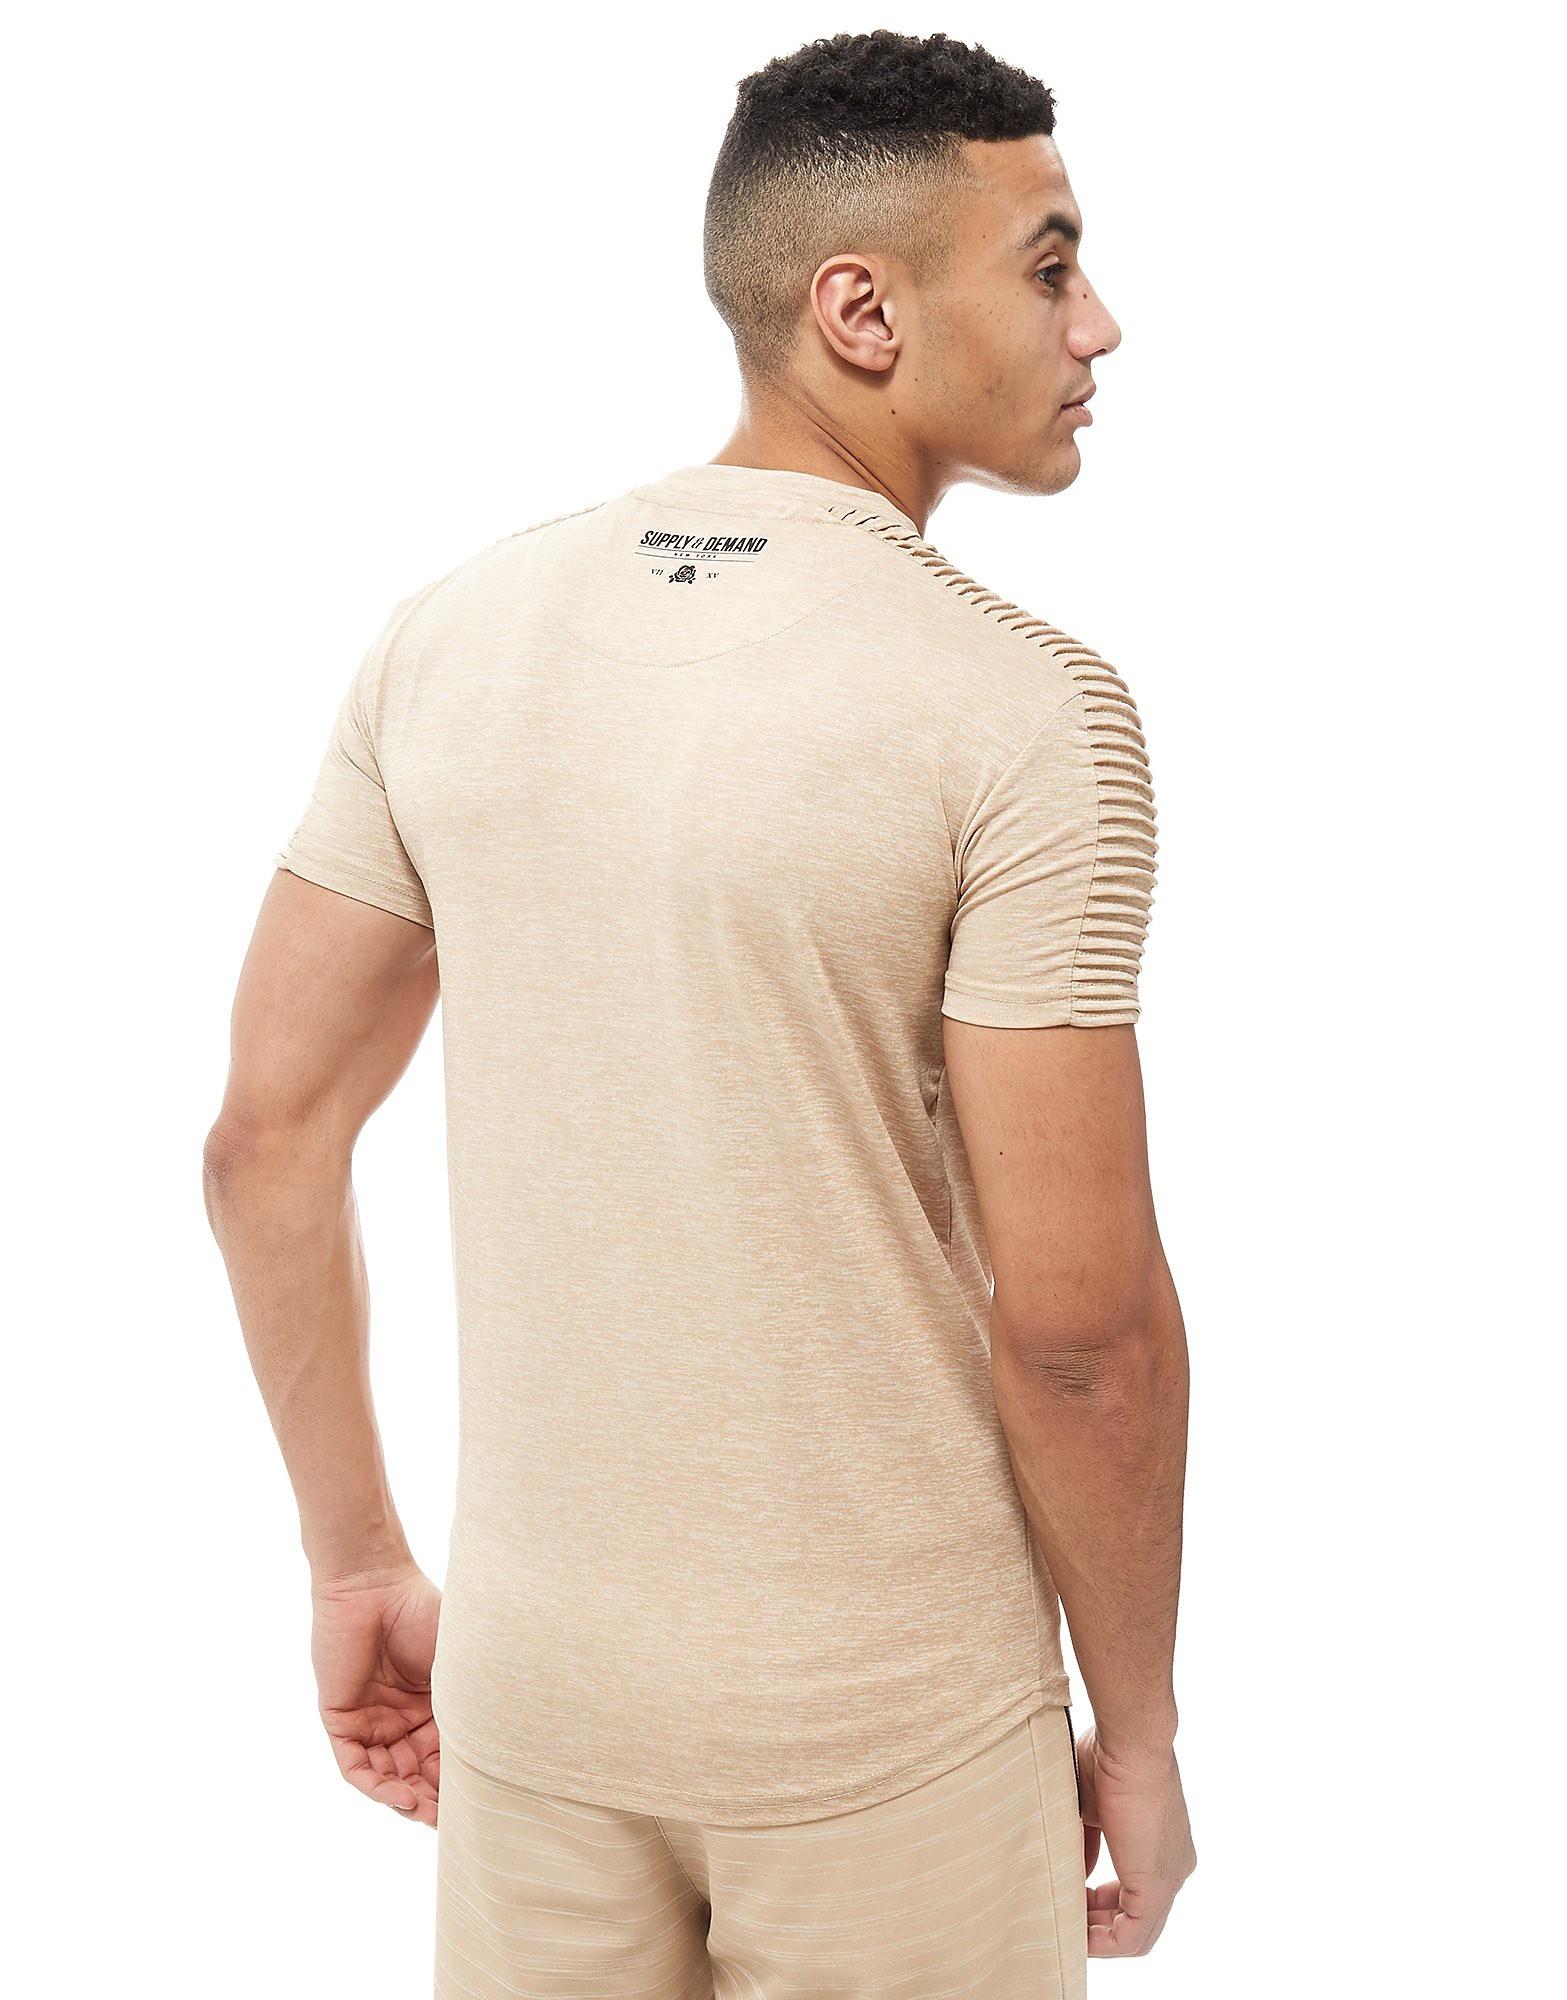 Supply & Demand Sanded T-Shirt